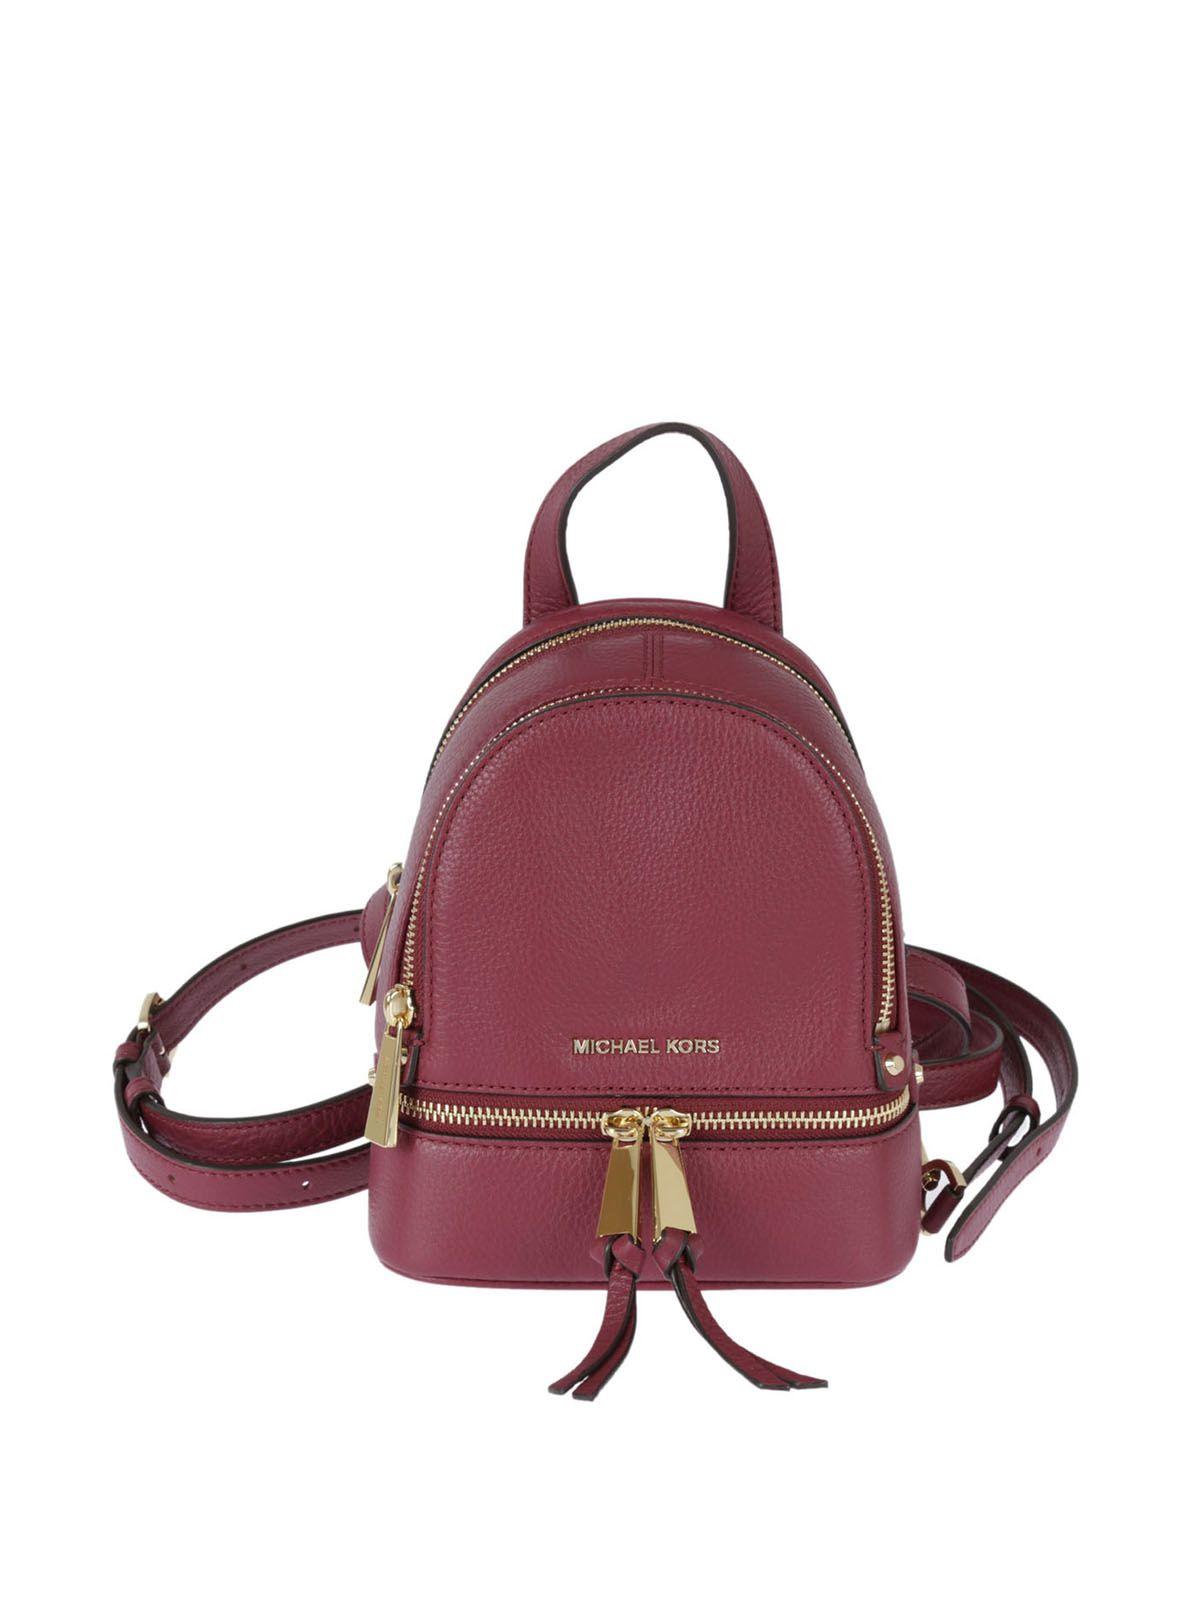 Michael Kors Convertible Backpack